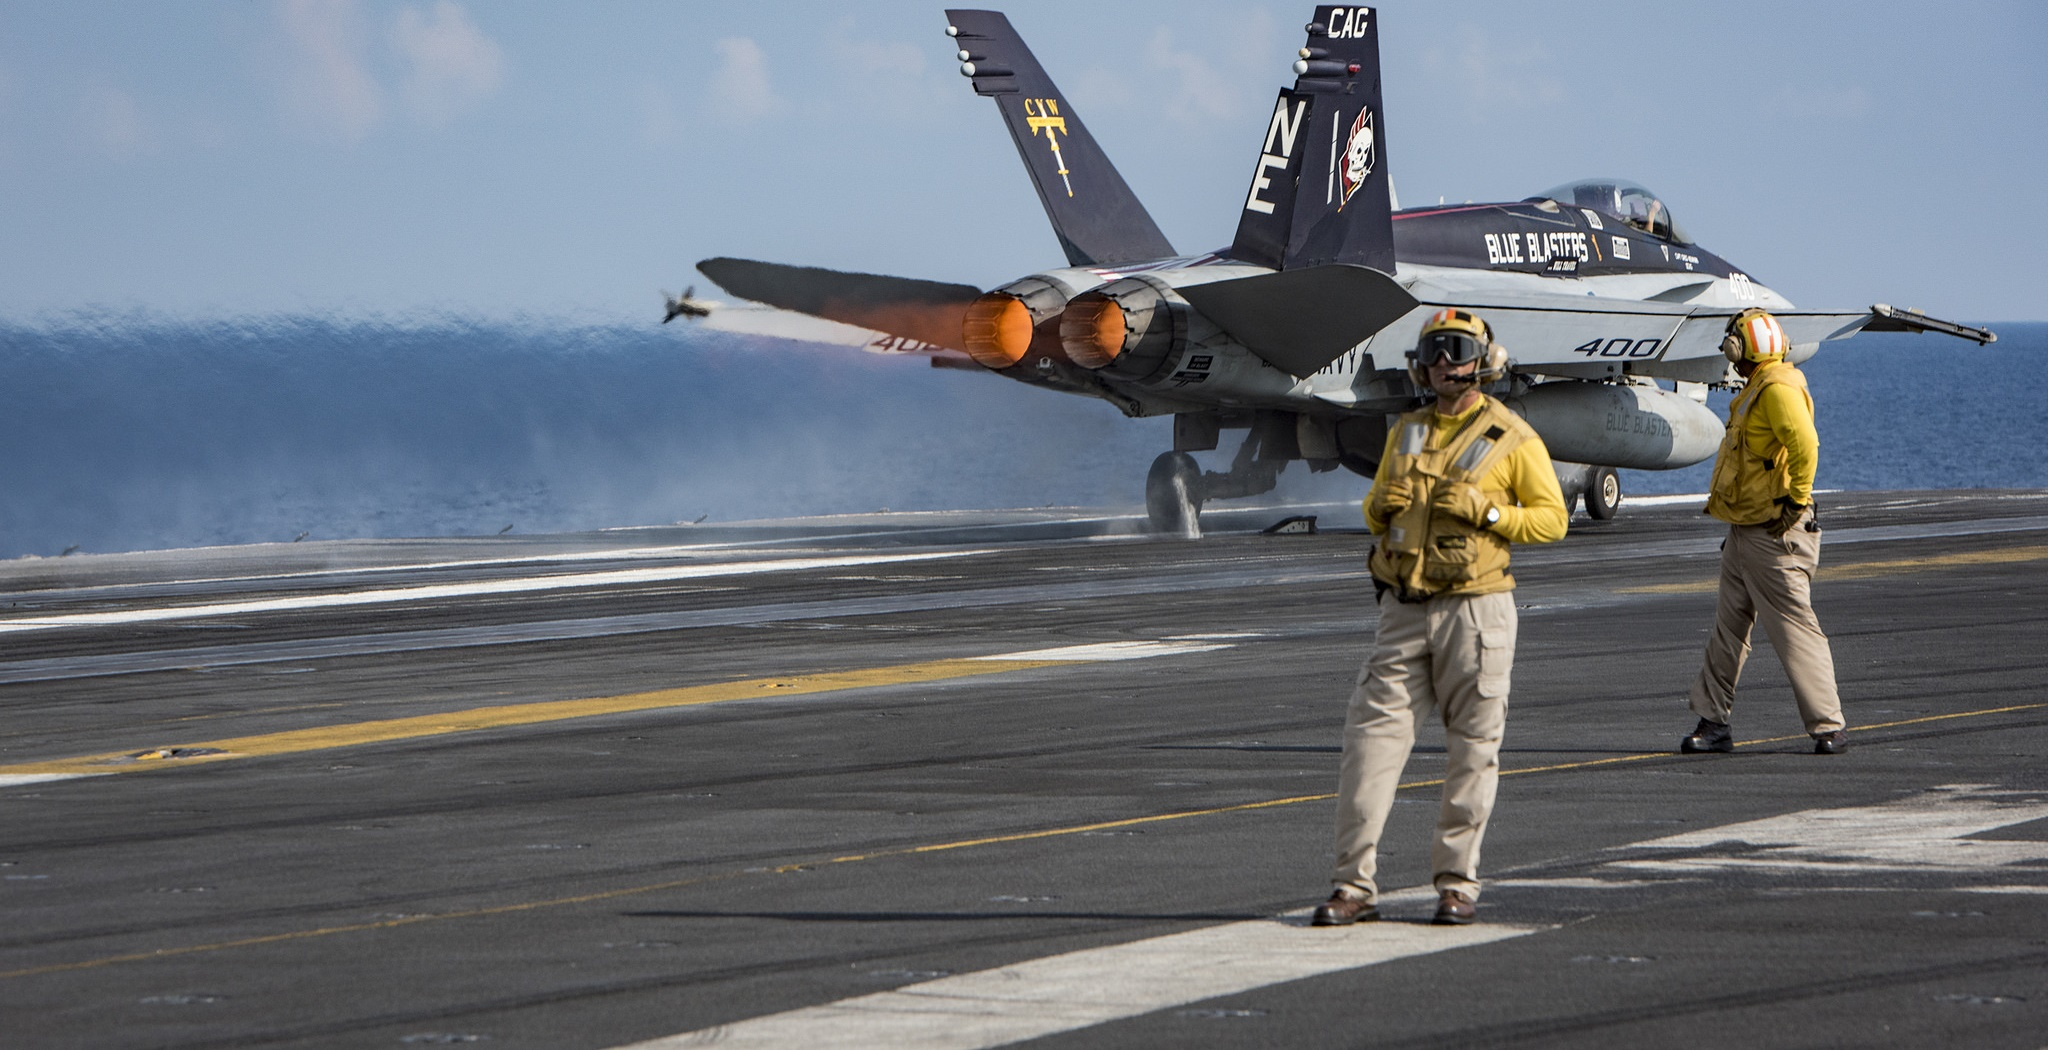 Photo: Flickr/US Navy